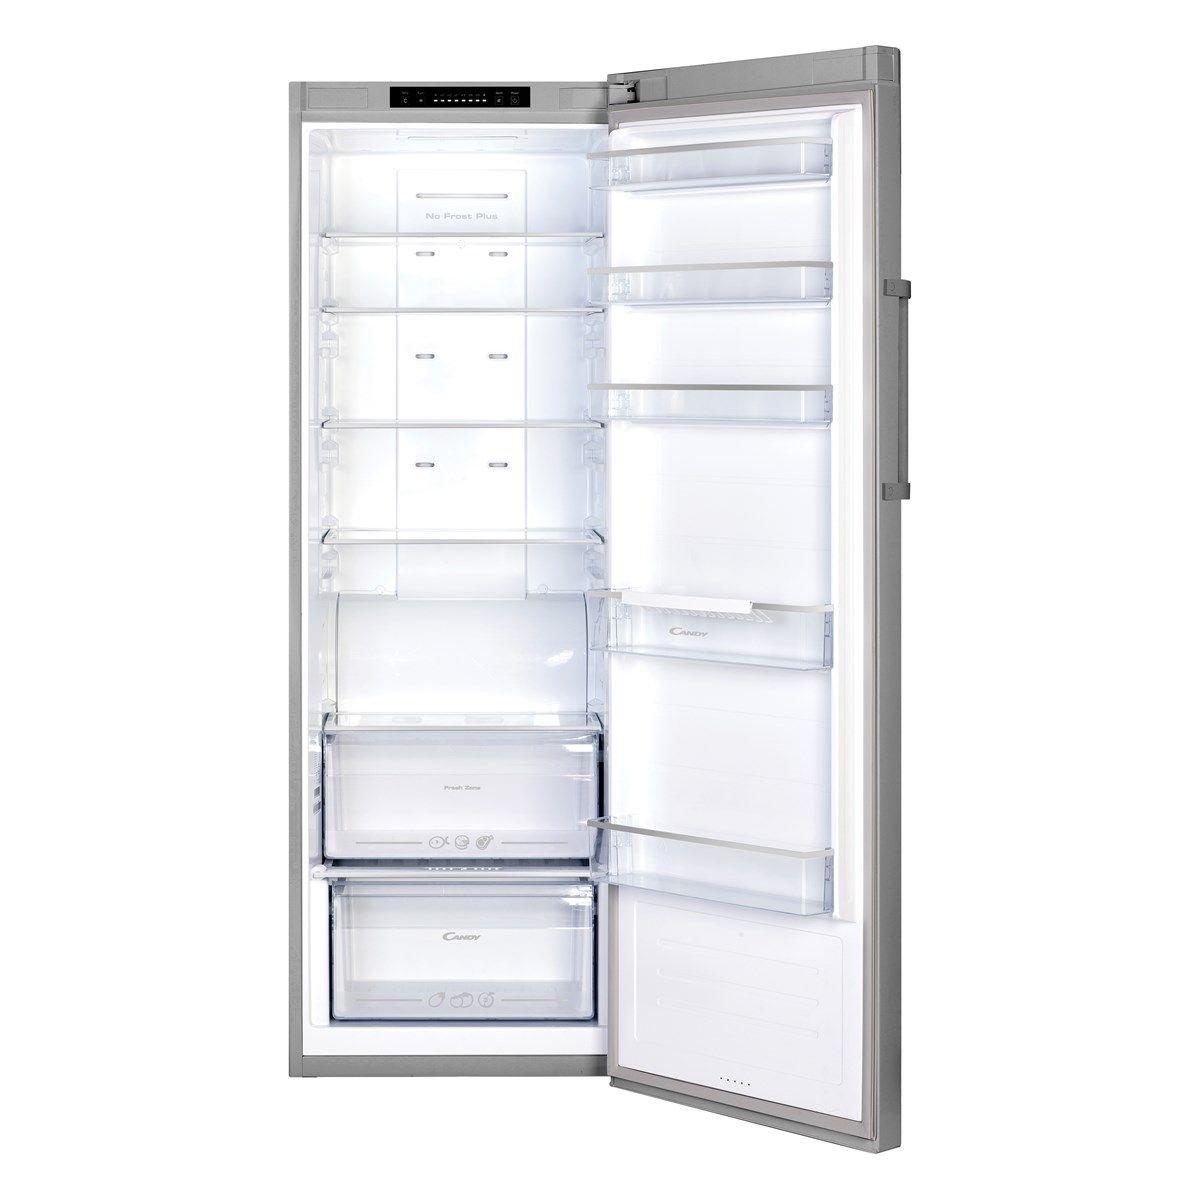 Réfrigérateur 1 porte CANDY CCLN6172XH